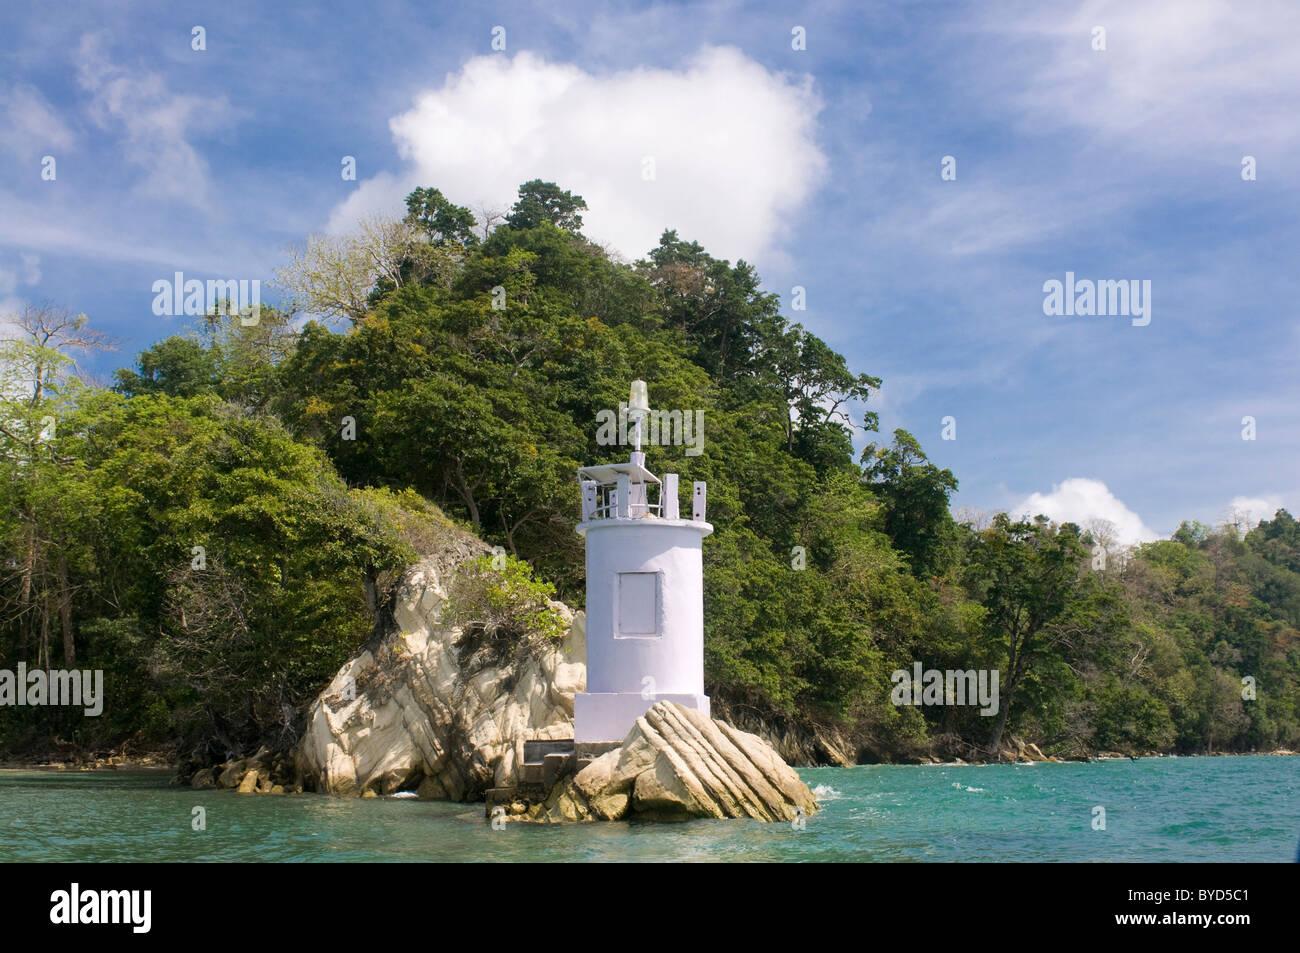 Small lighthouse on the coast, Havelock Island, Andaman Islands, India, Asia - Stock Image